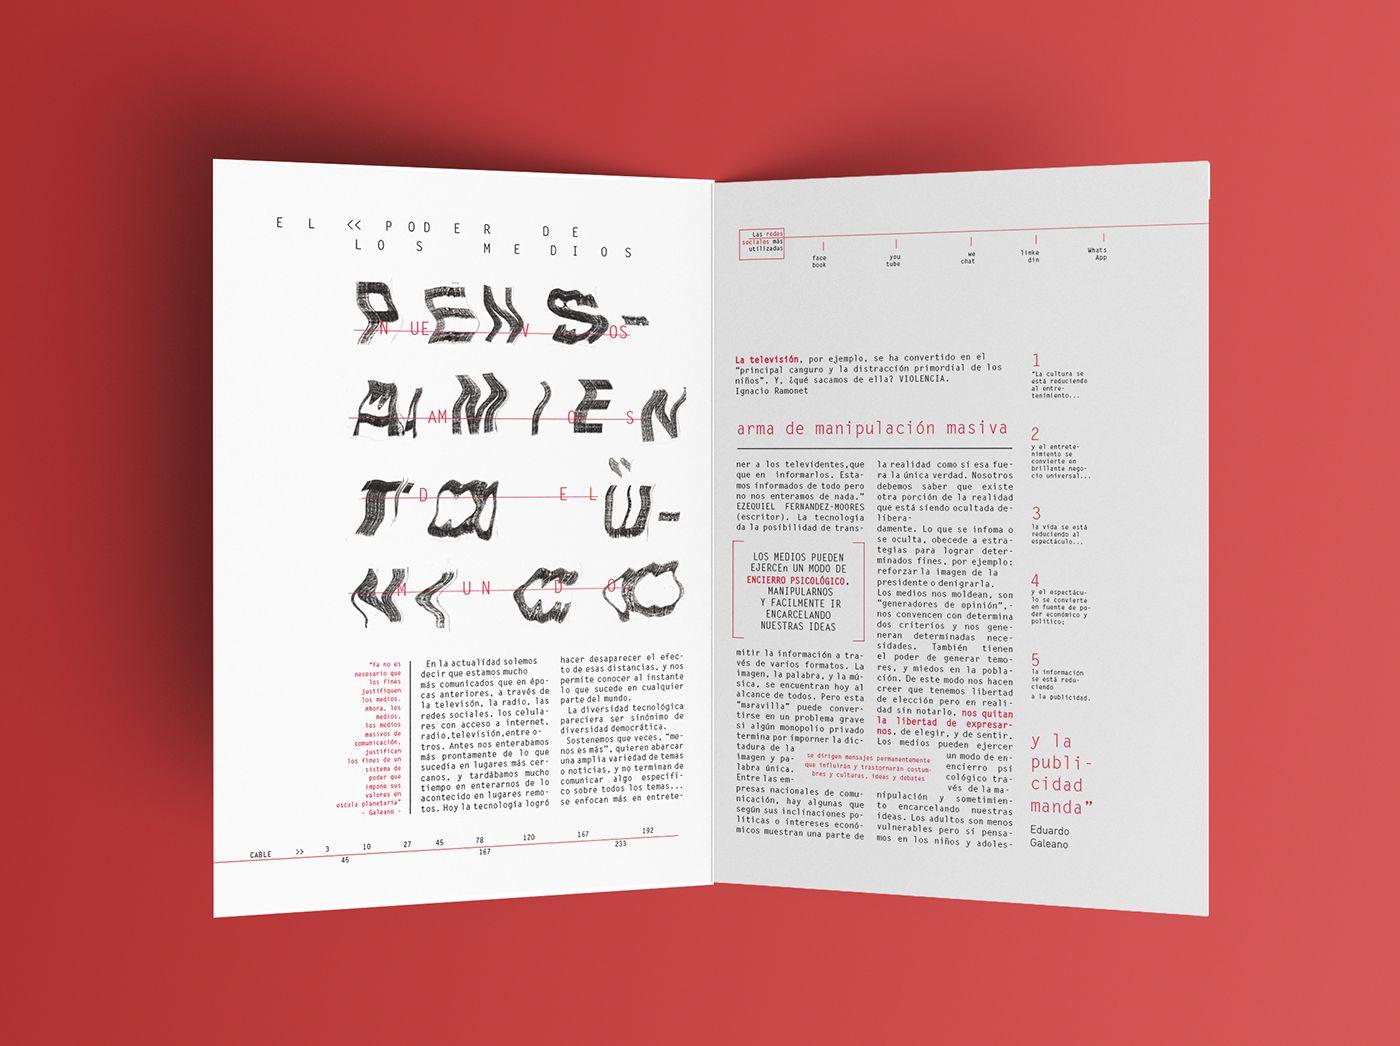 Cárcel - Desplegable tipográfico on Behance